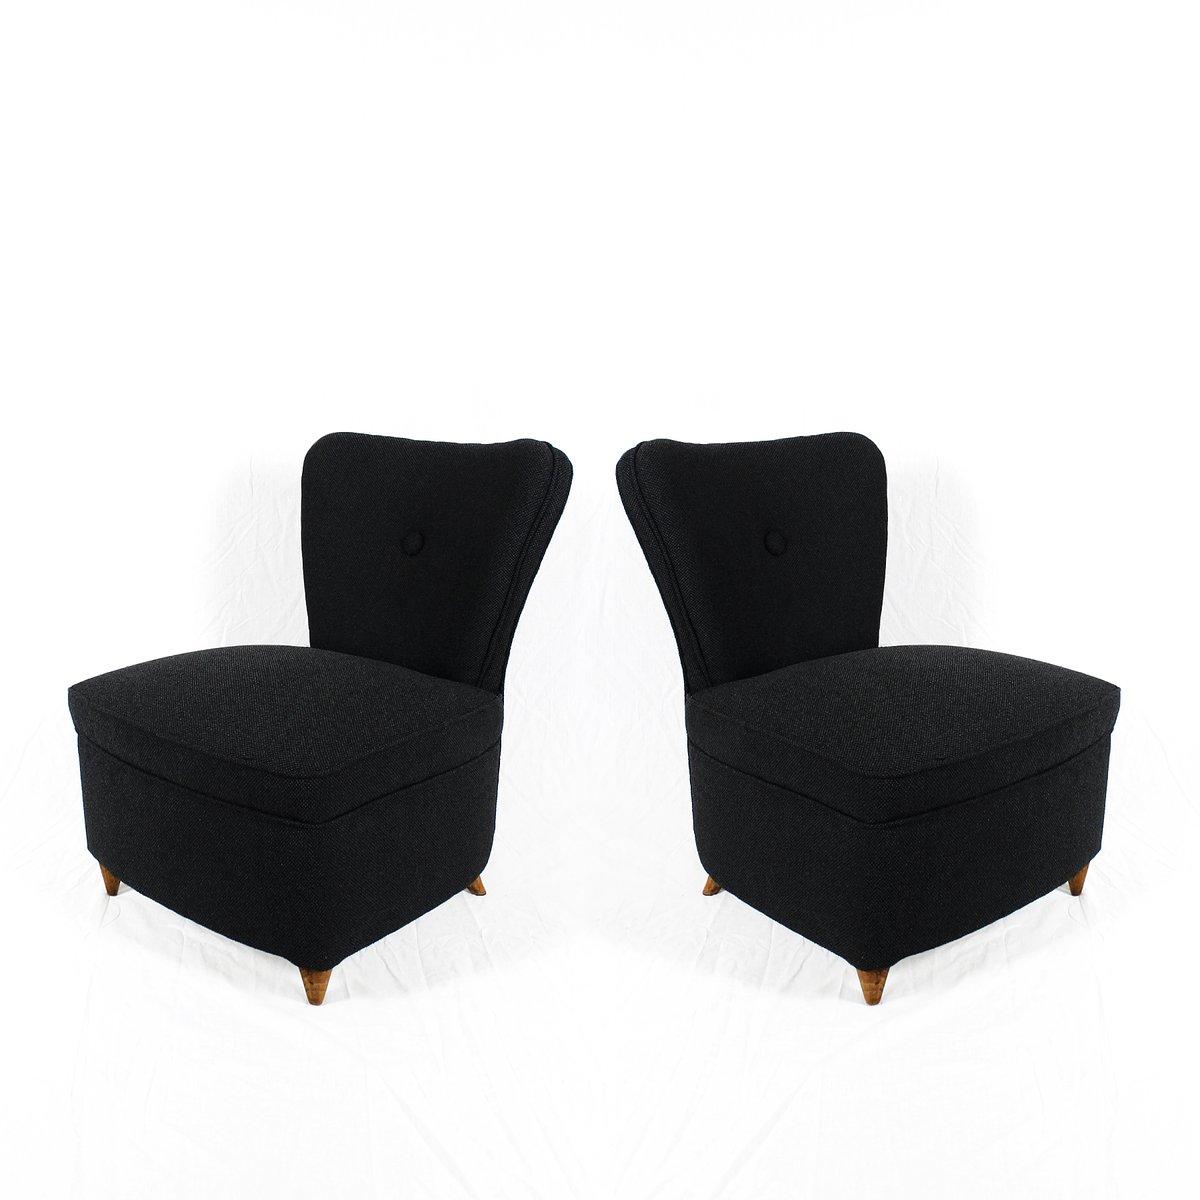 kleine schlafzimmer sessel 1940er 2er set bei pamono kaufen. Black Bedroom Furniture Sets. Home Design Ideas